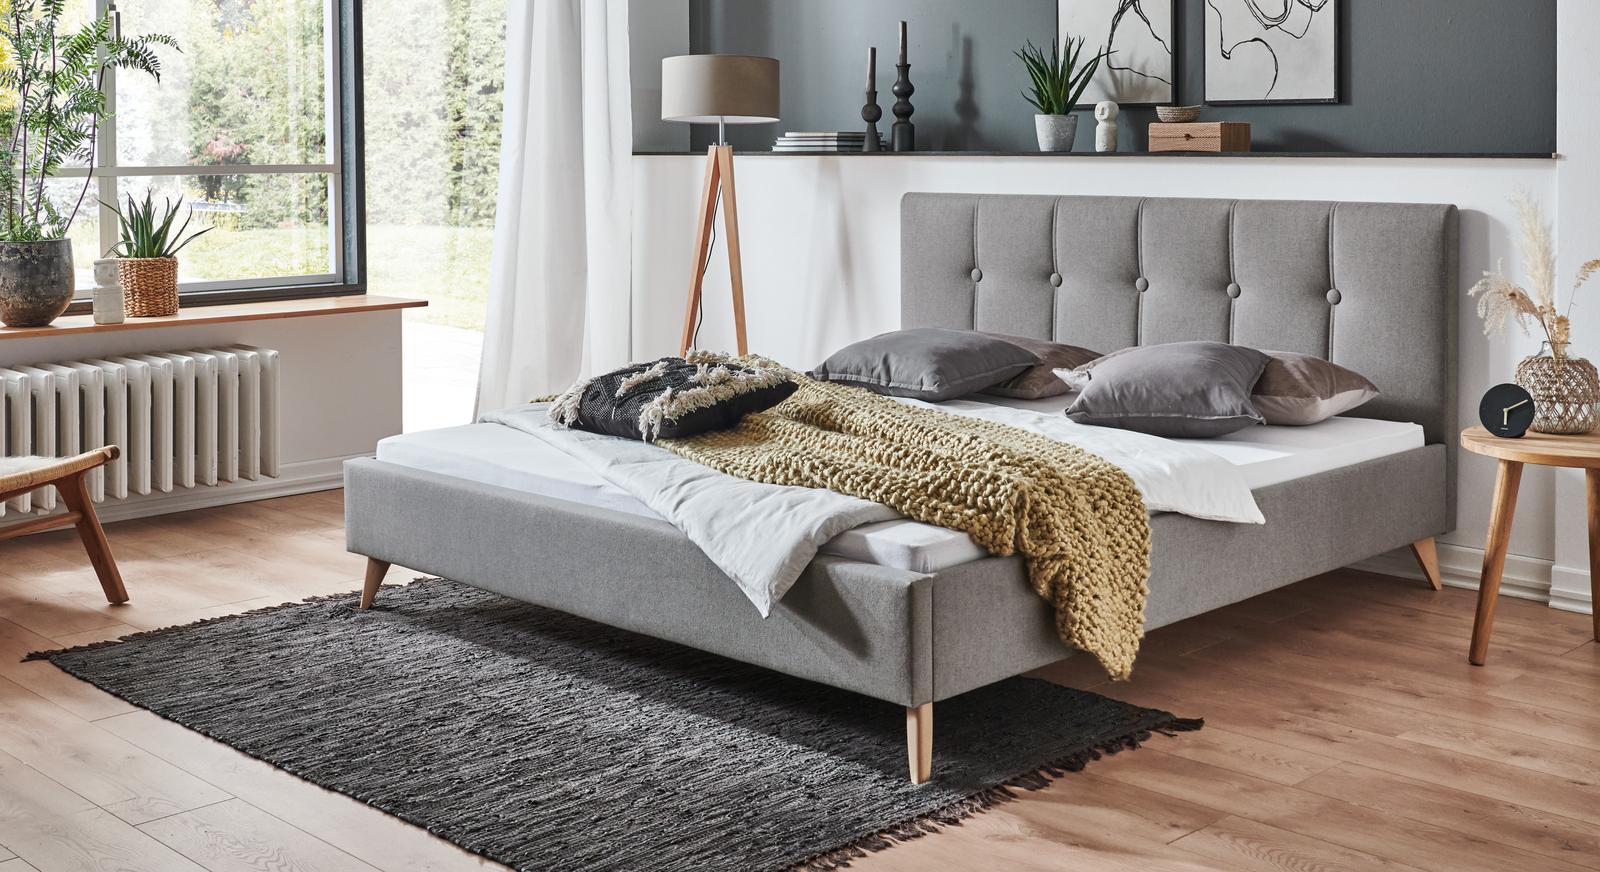 Bett Maliana im skandinavischen Look